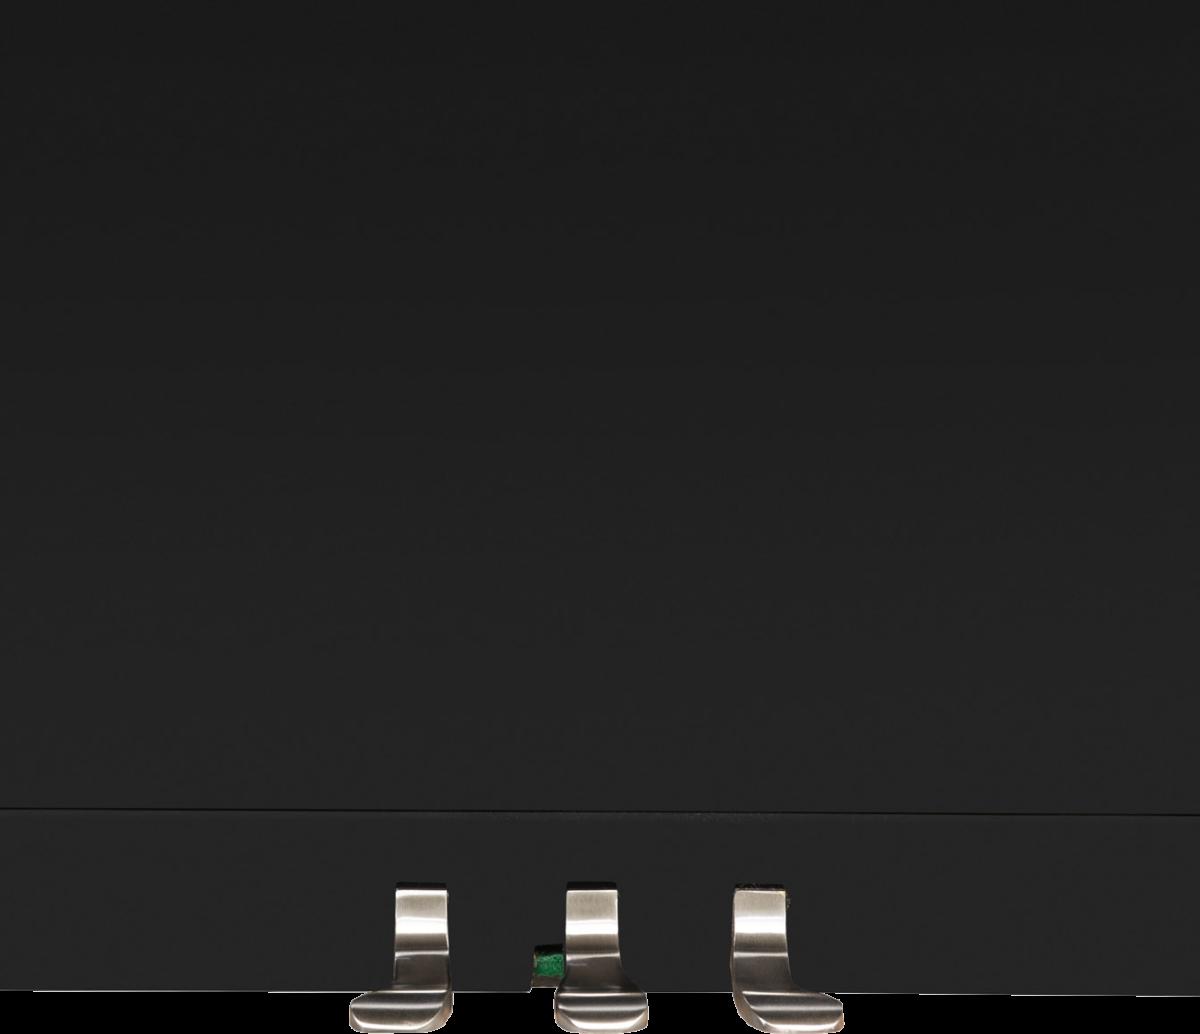 piano-vertical-essex-eup123-chrome-nuevo-negro-plata-pedales